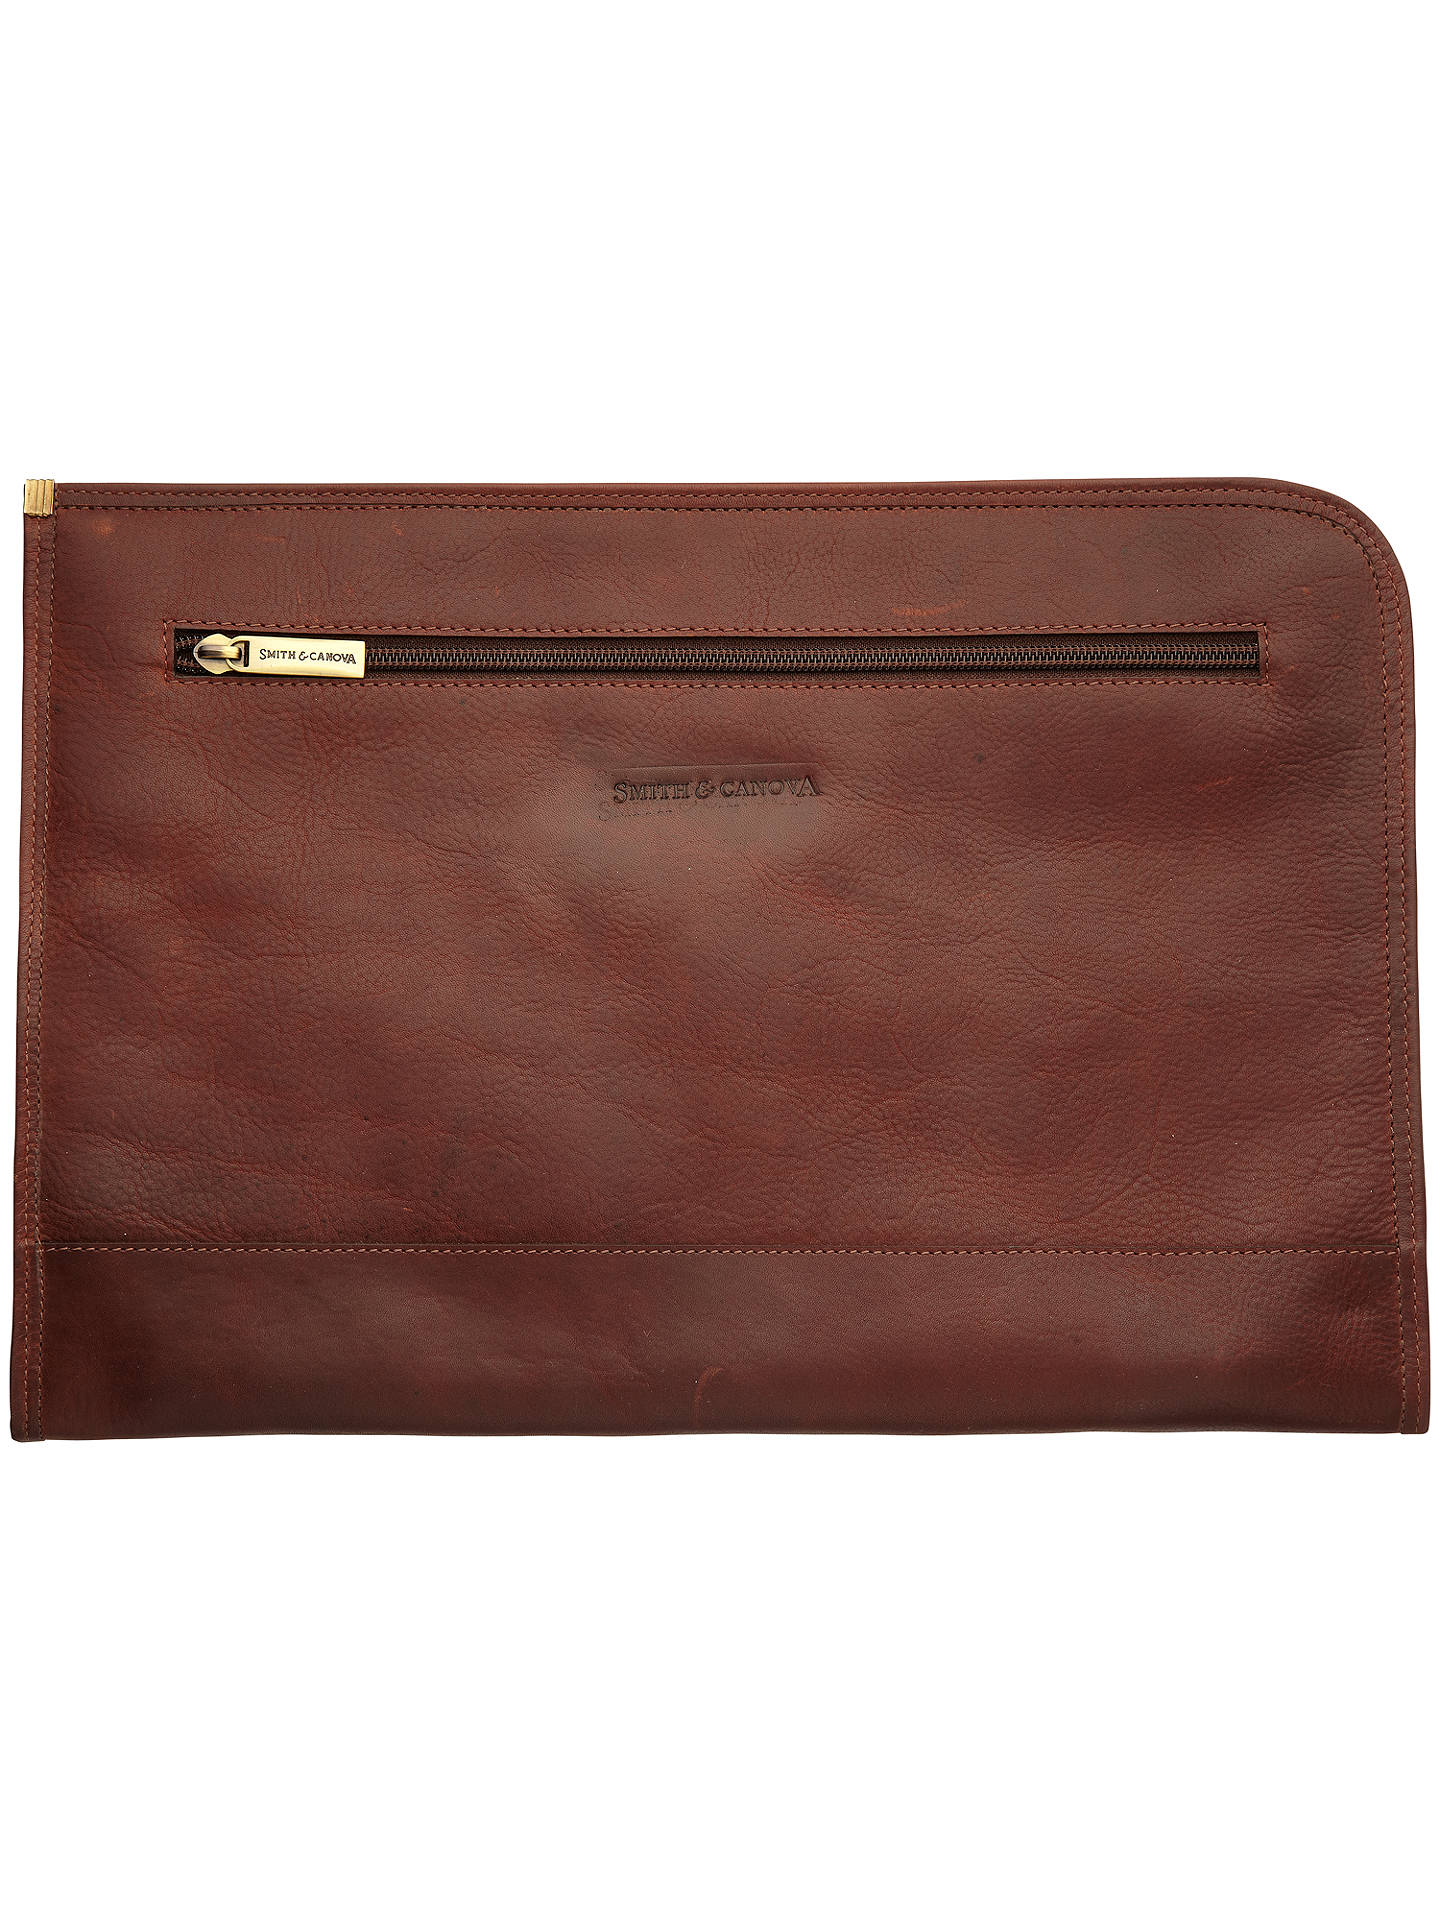 a11b132c85ef BuySmith   Canova Men s Leather Folio